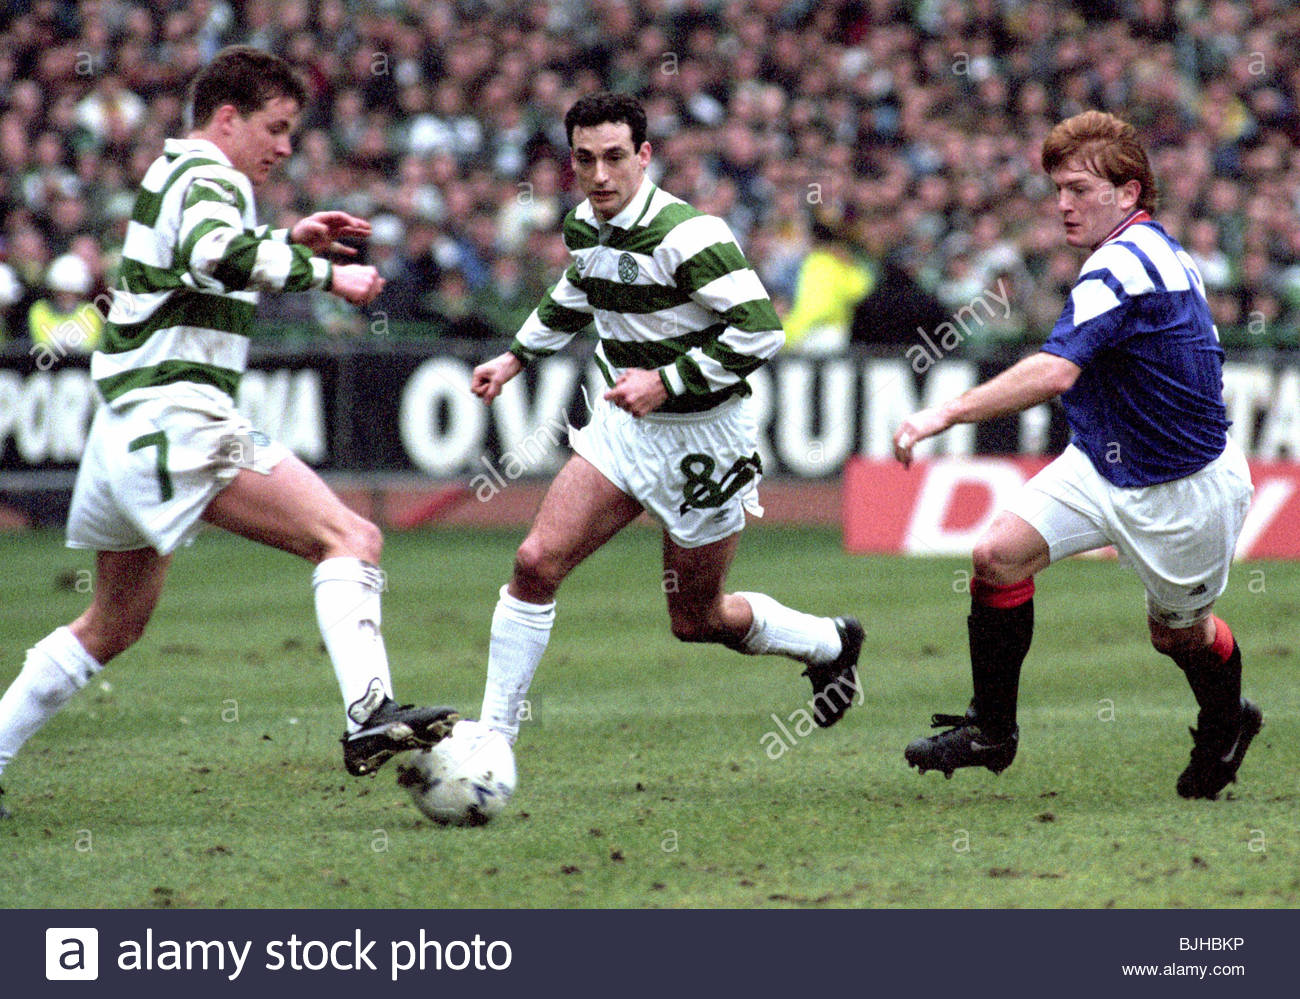 20/03/93 PREMIER DIVISION CELTIC V RANGERS (2-1) CELTIC PARK - GLASGOW Celtic's Stuart Slater (left) controls - Stock Image